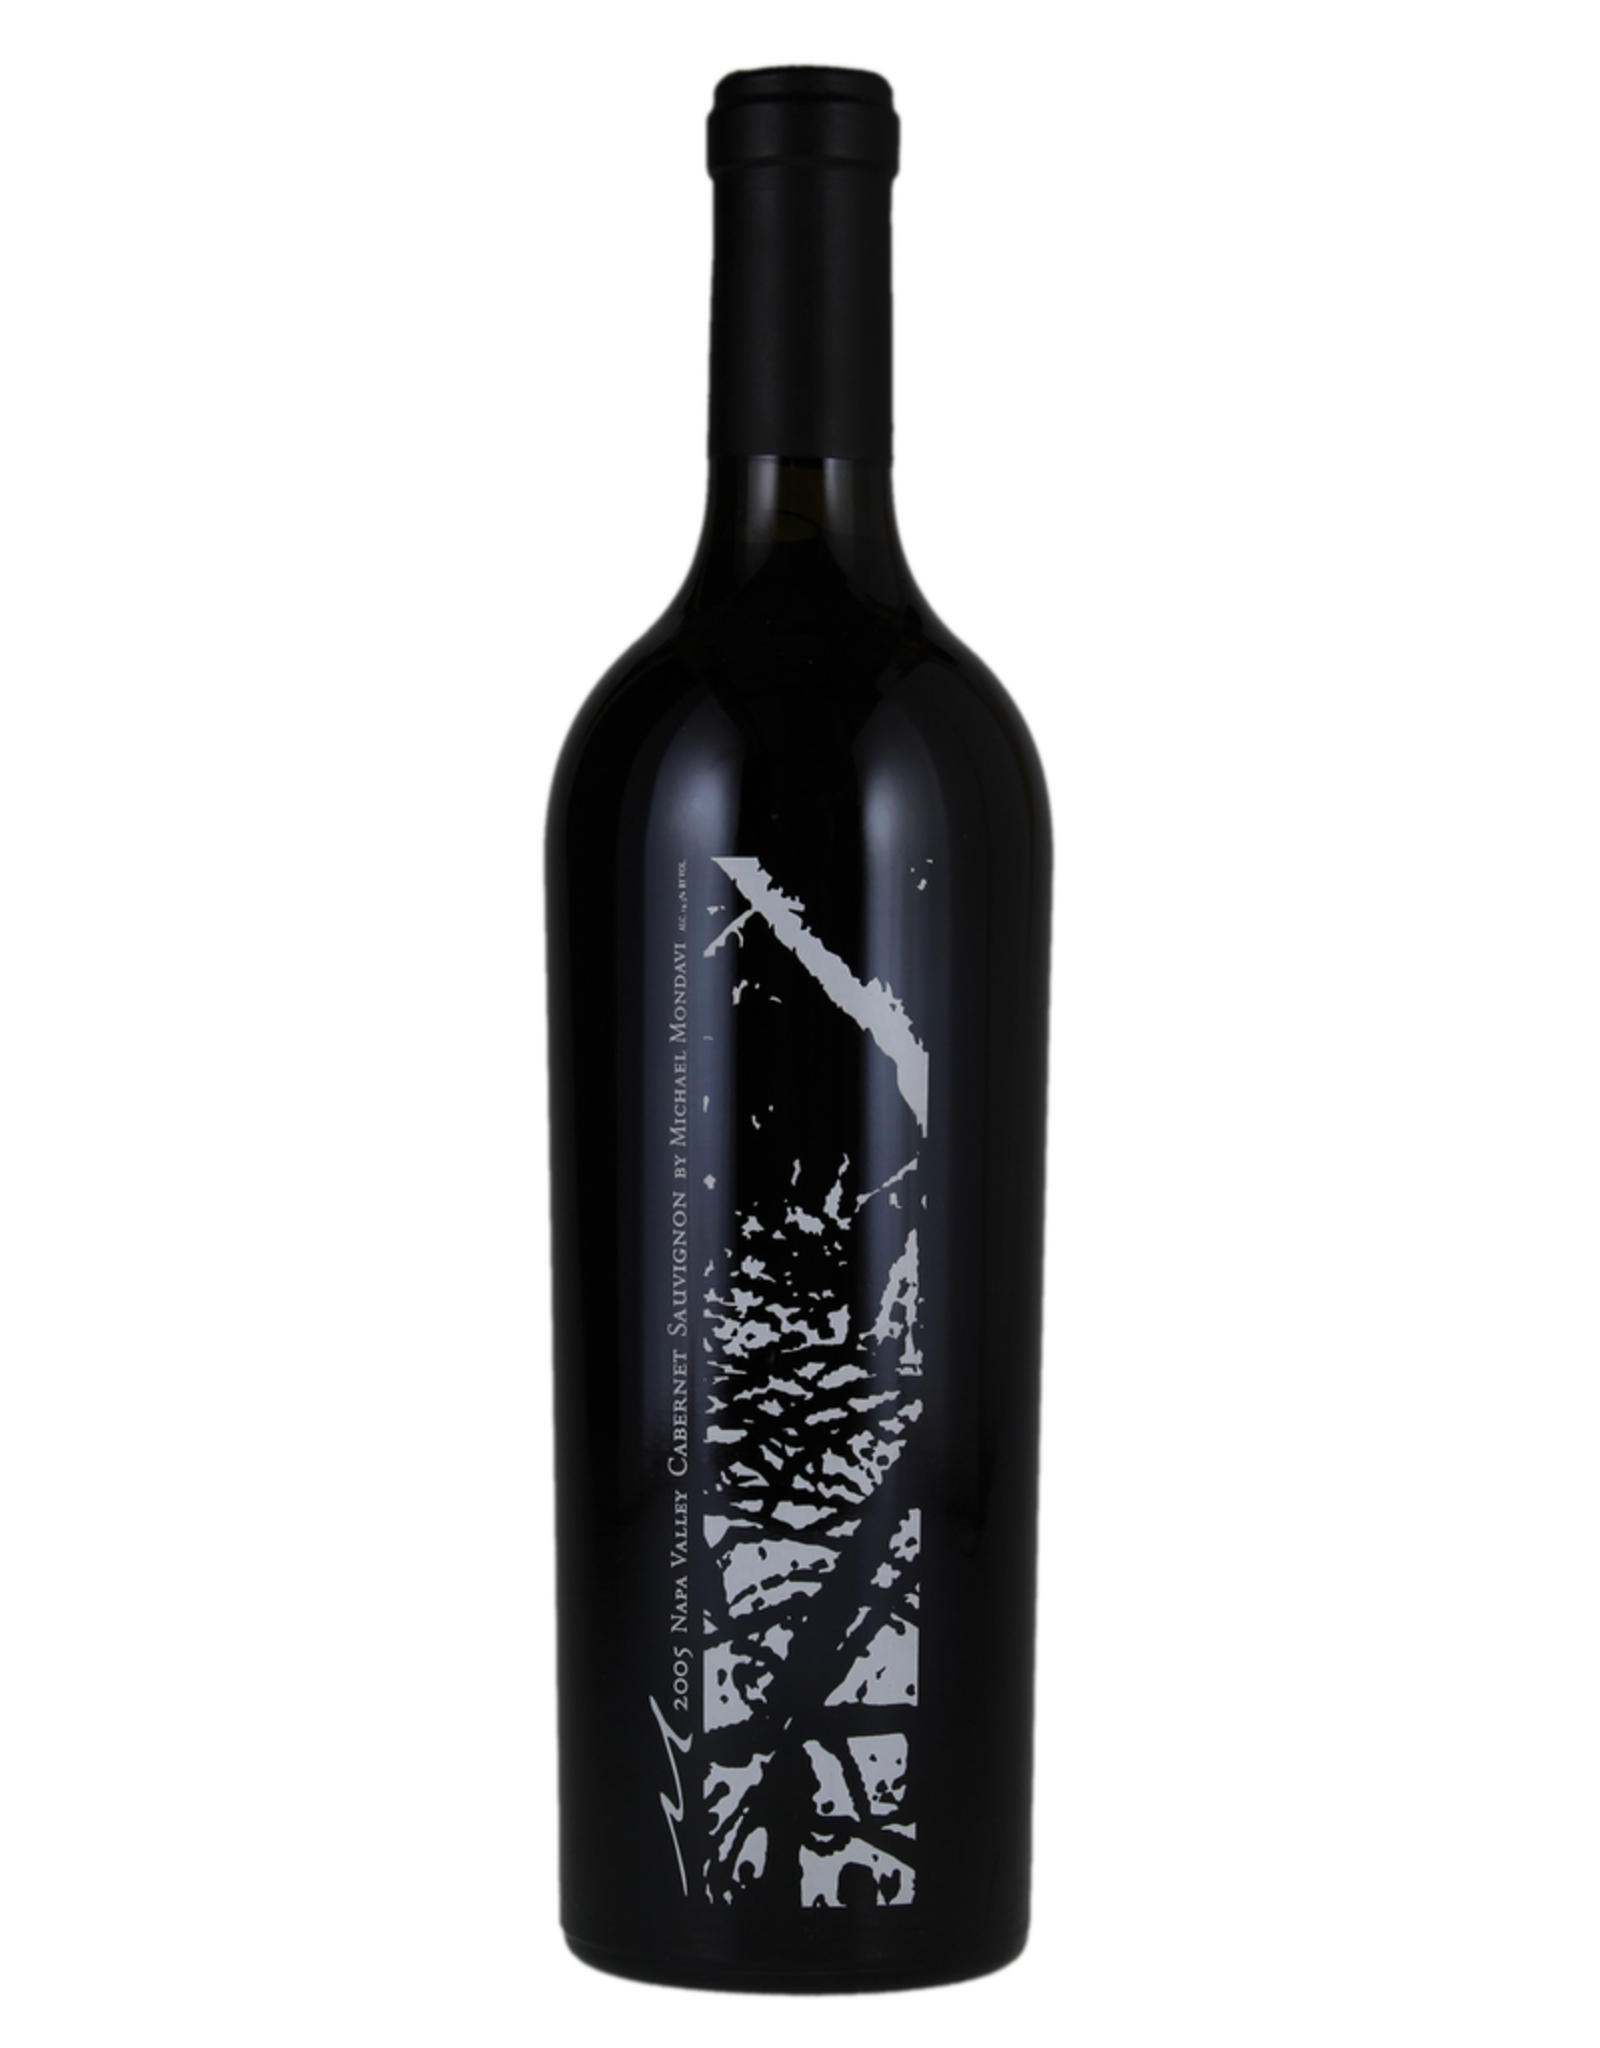 Red Wine 2005, M by Michael Mondavi, Cabernet Sauvignon, Animo Vineyard Atlas Peak, Napa Valley, California, 14.3% Alc, CT91.7